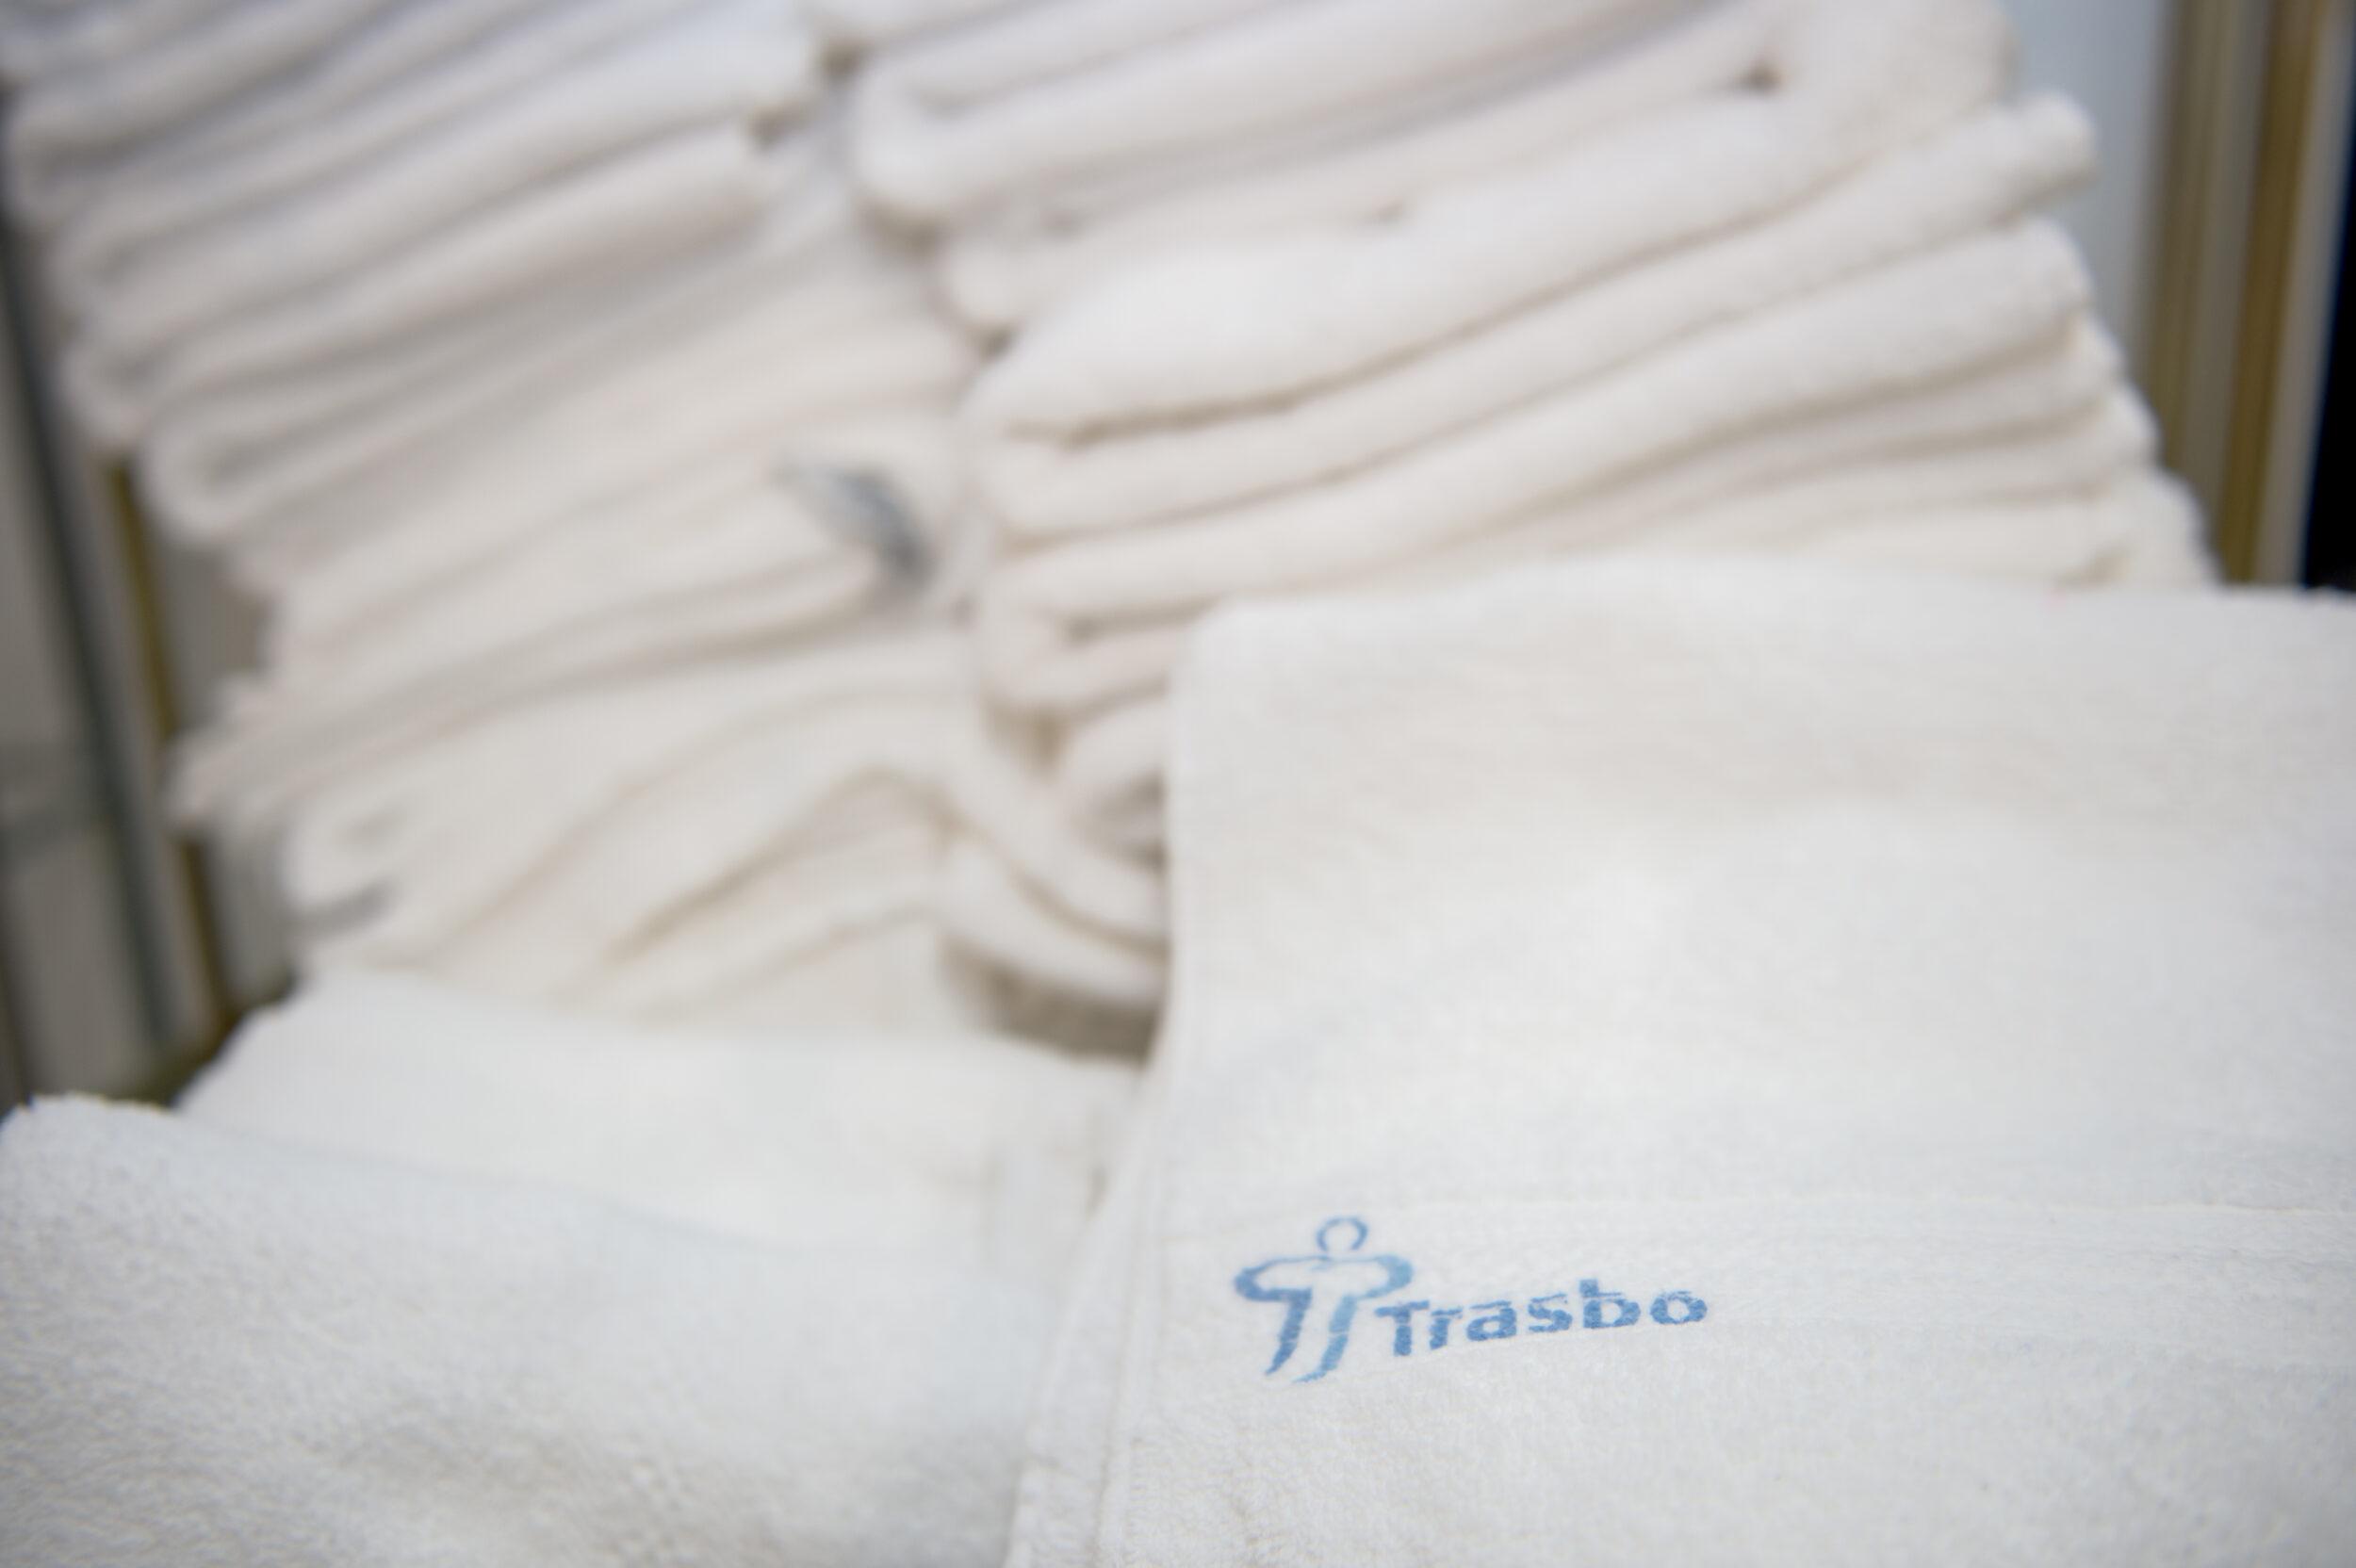 TRASBO vaskeriservice